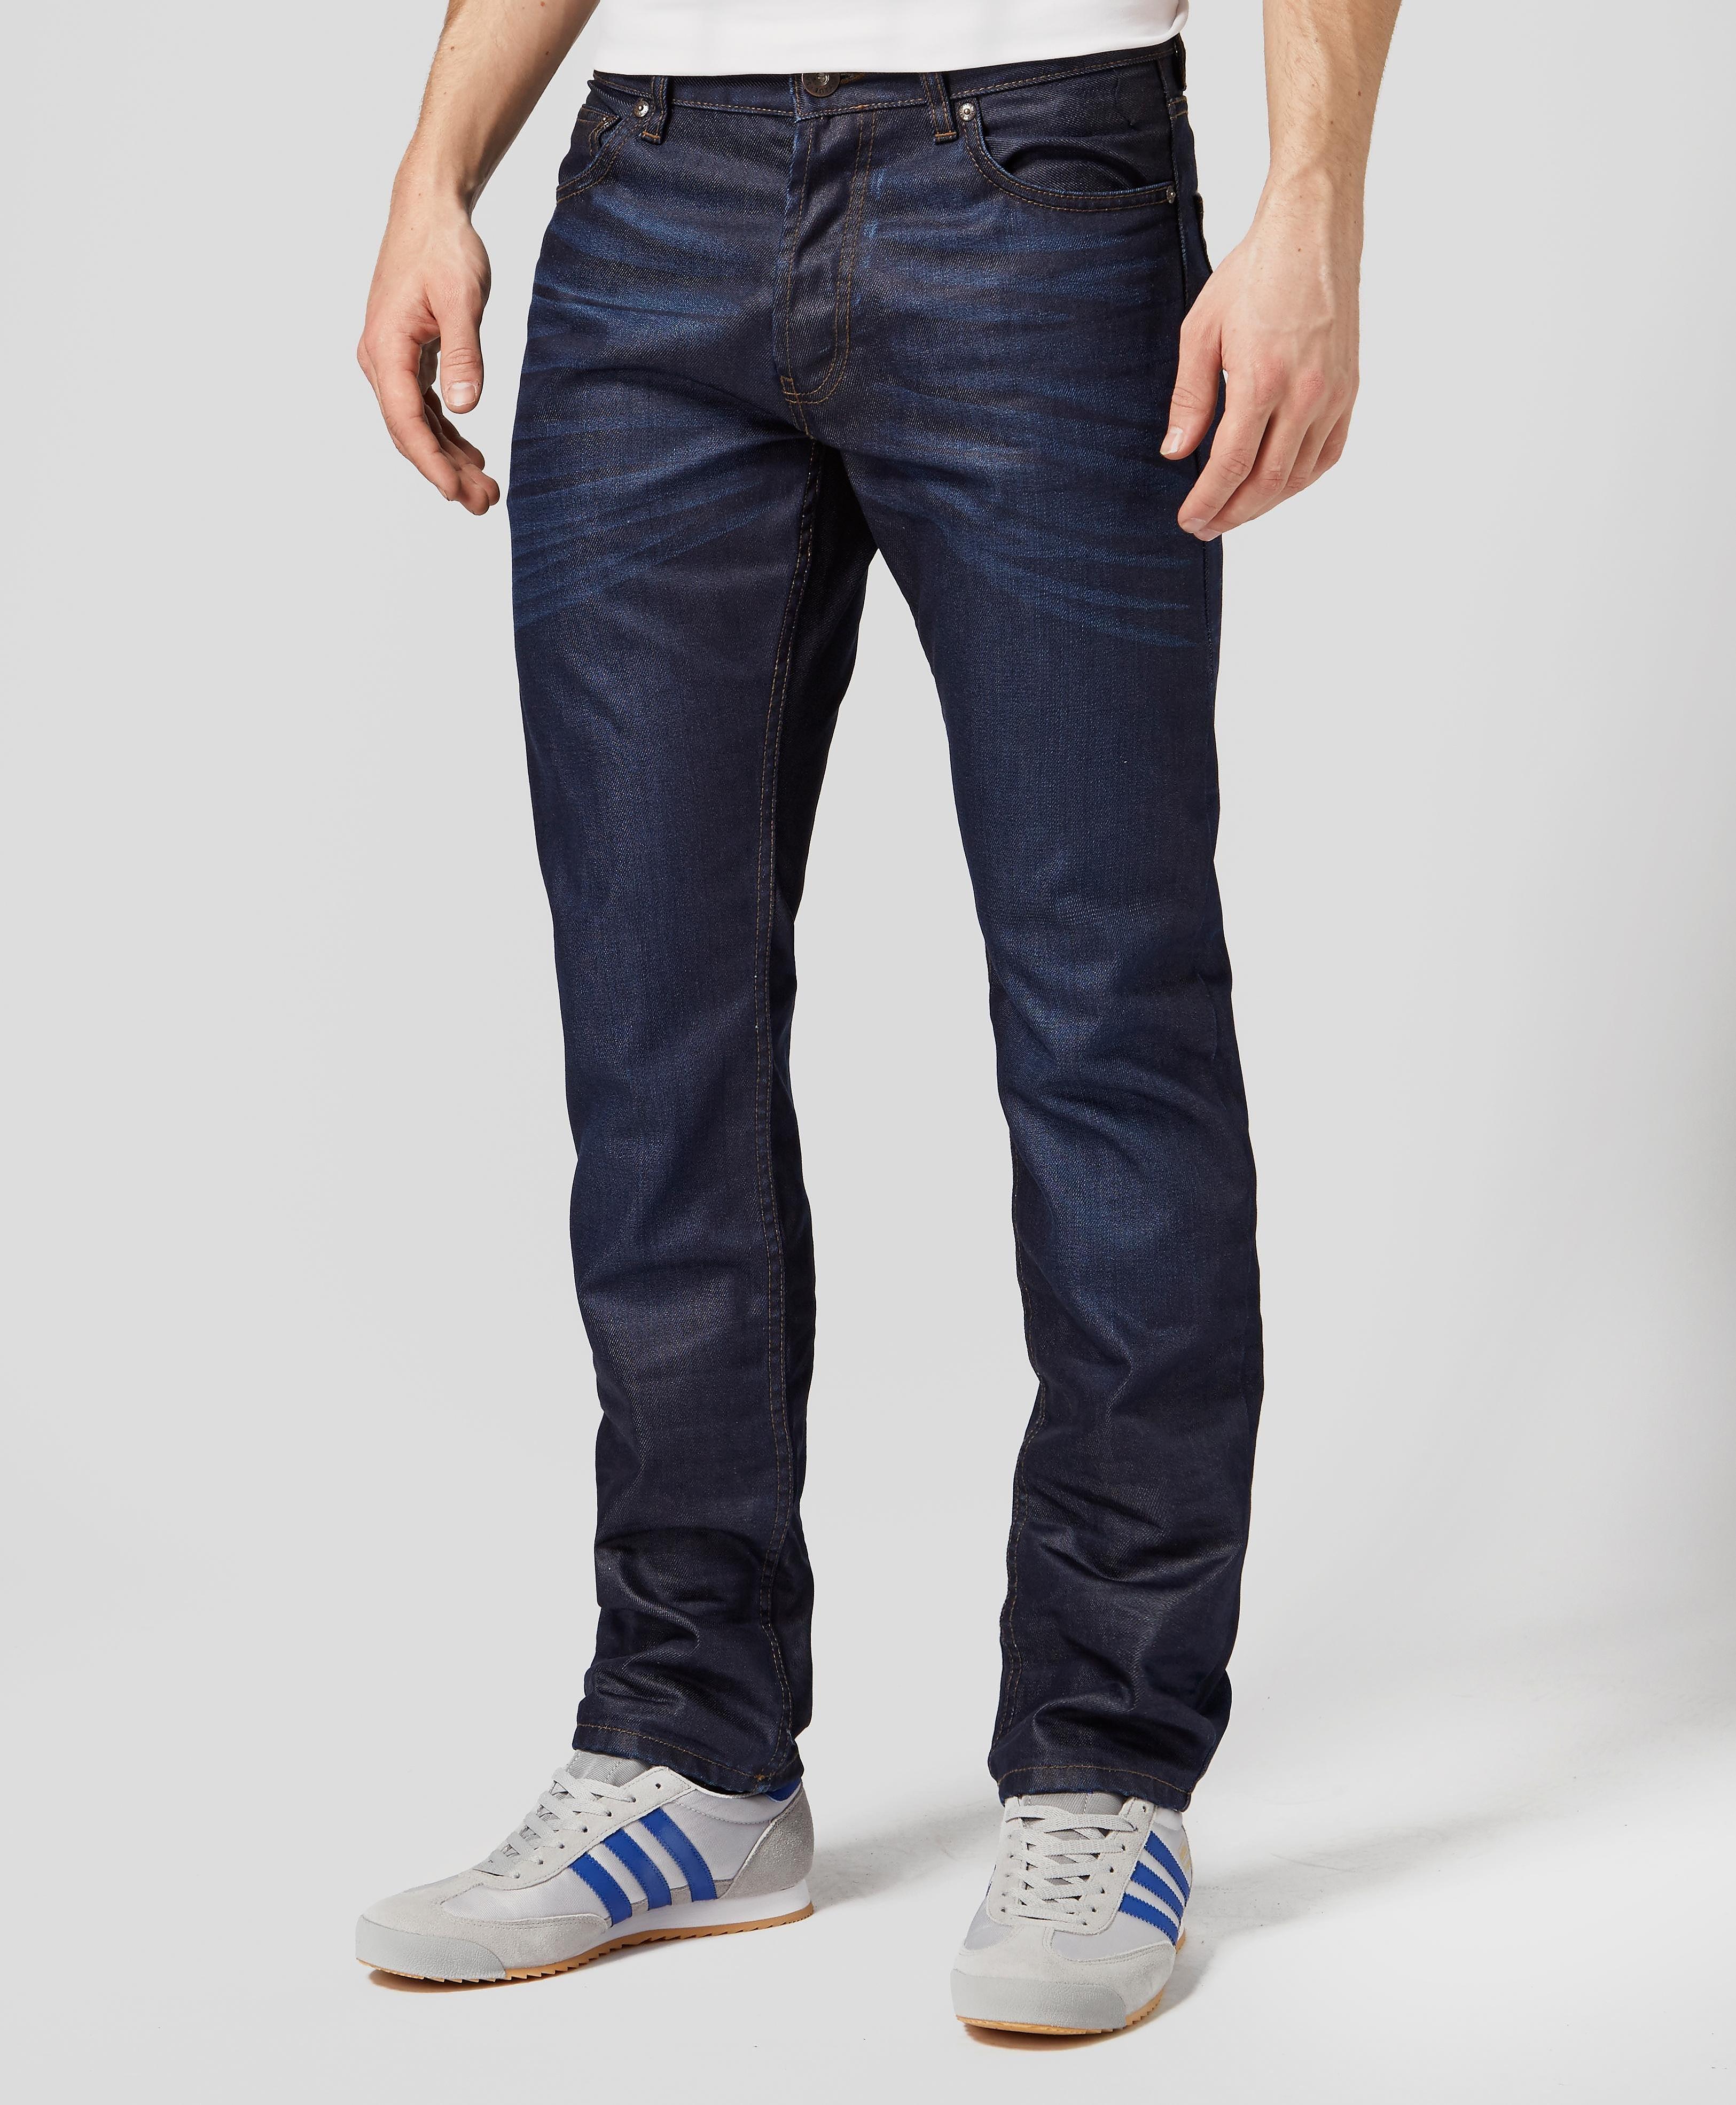 One True Saxon Murphy Slim Fit Jeans - Exclusive